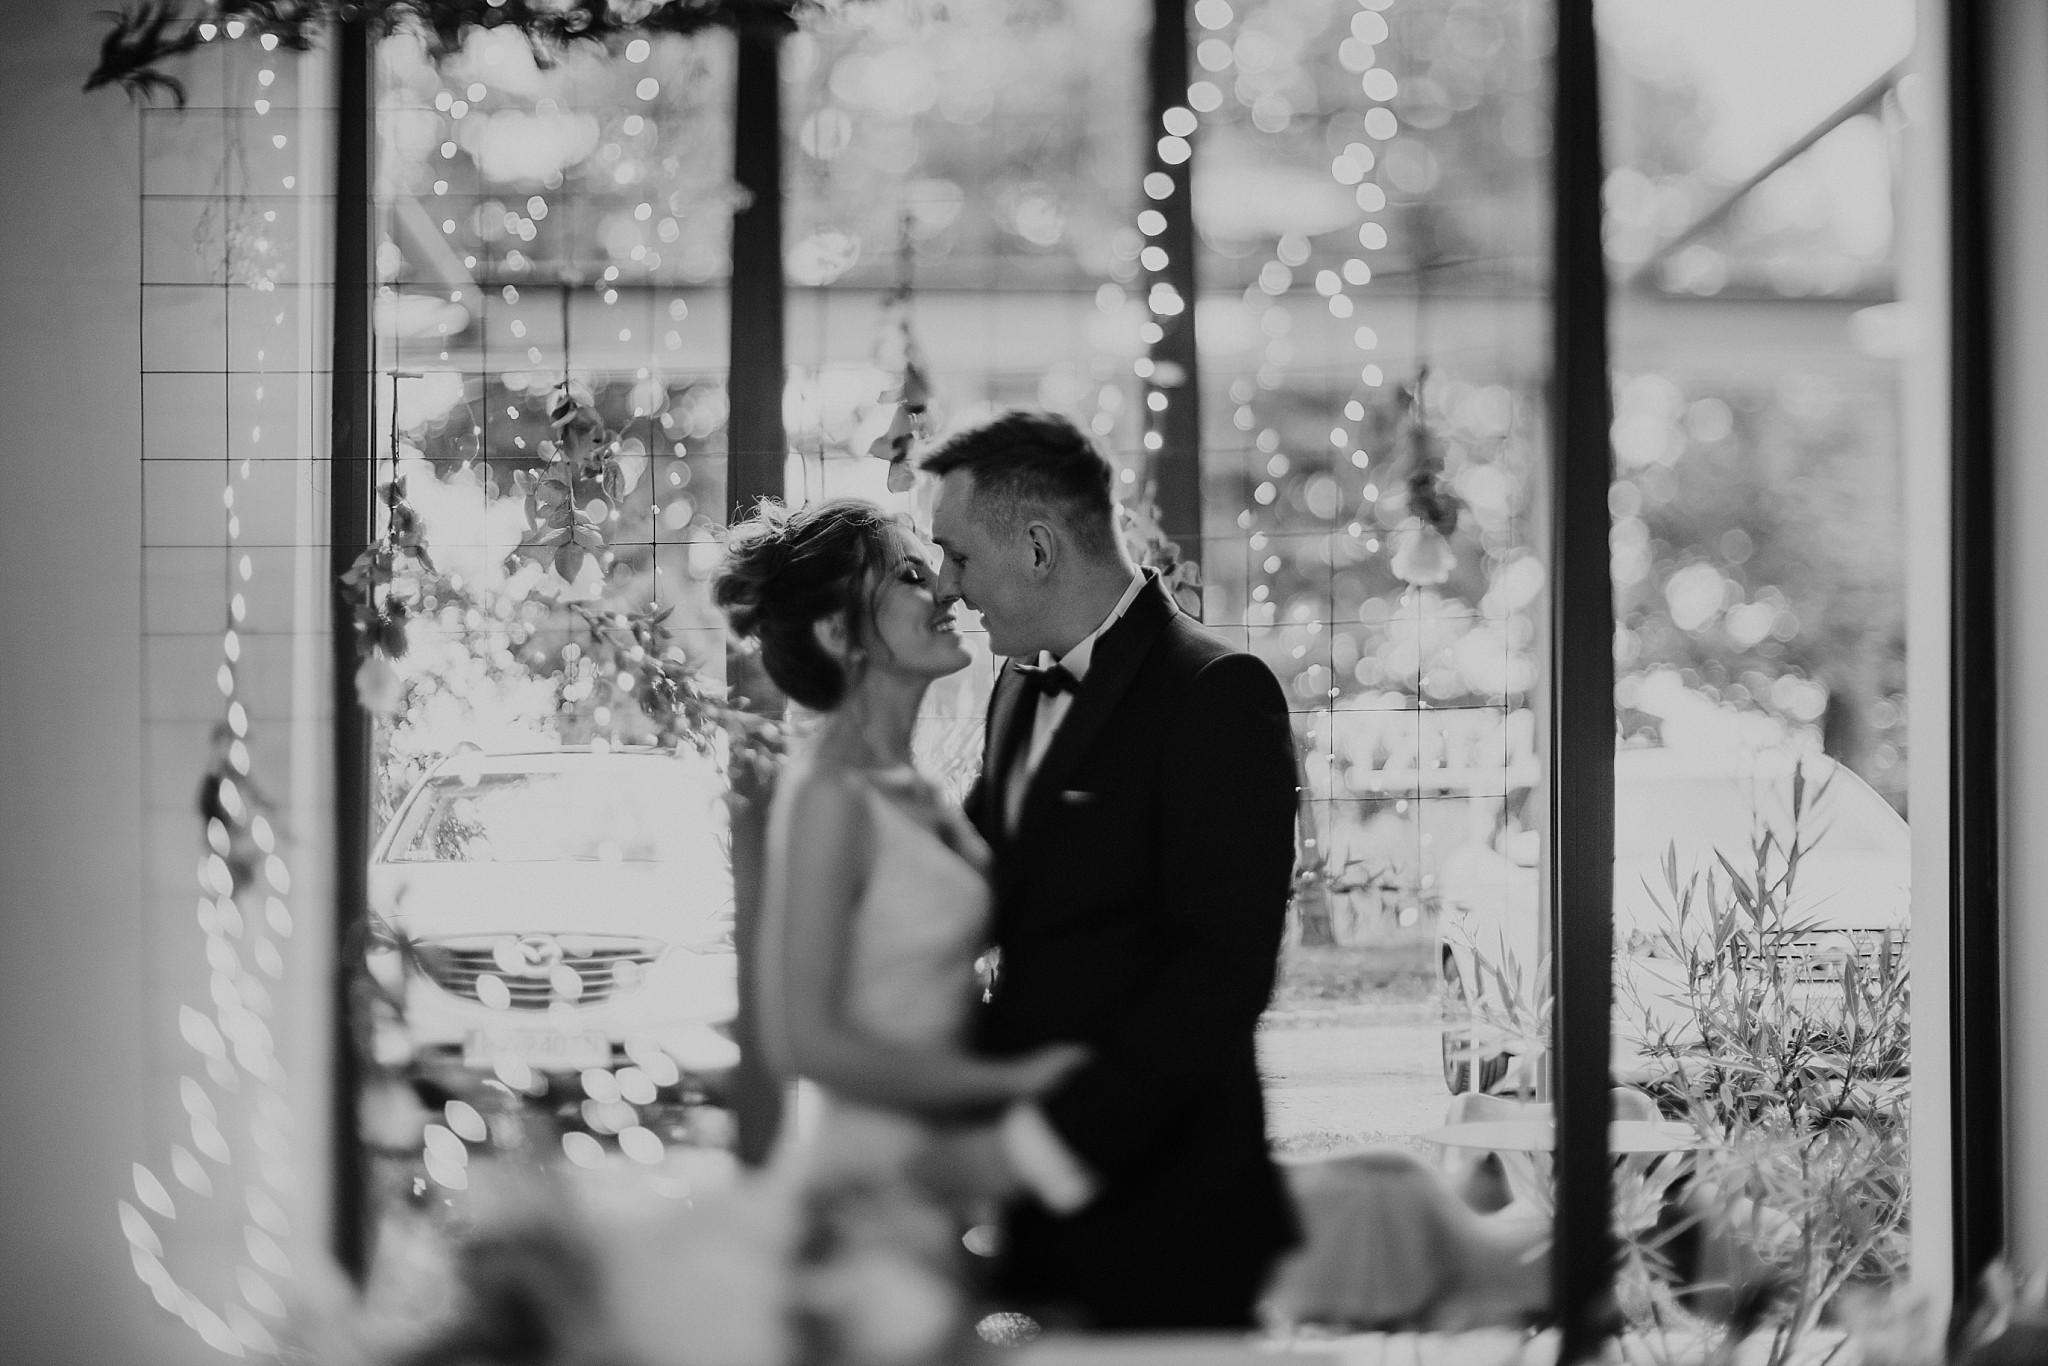 fotograf poznan wesele dobra truskawka piekne wesele pod poznaniem wesele w dobrej truskawce piekna para mloda slub marzen slub koronawirus slub listopad wesele koronawirus 305